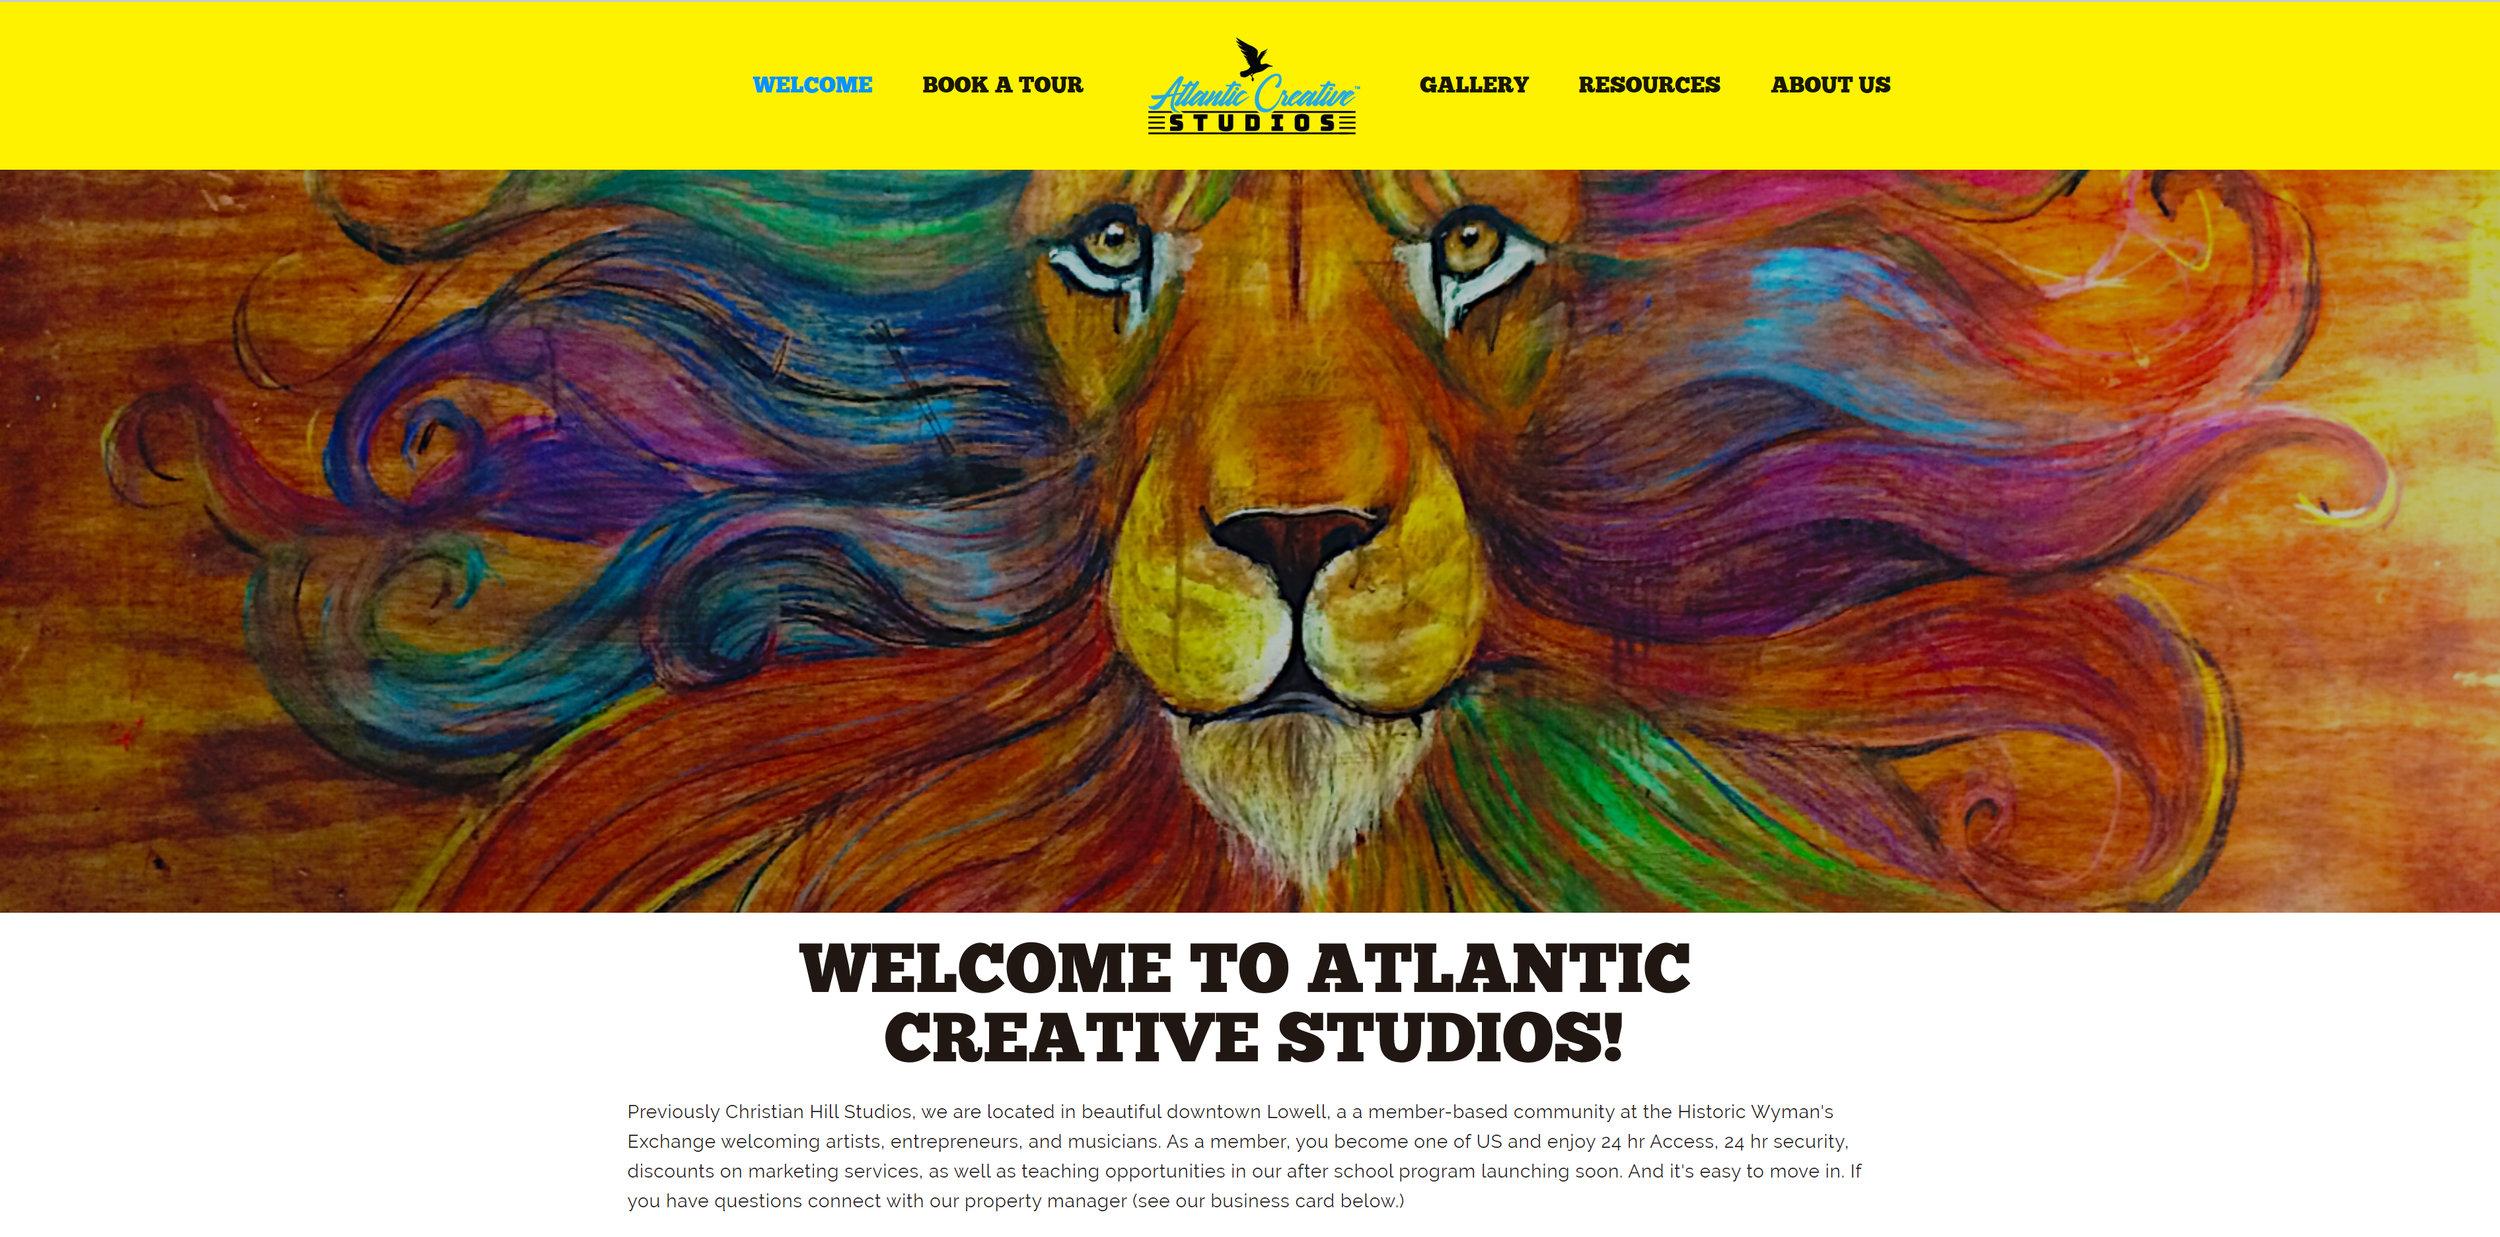 Atlantic Creative Studios of Lowell, MA